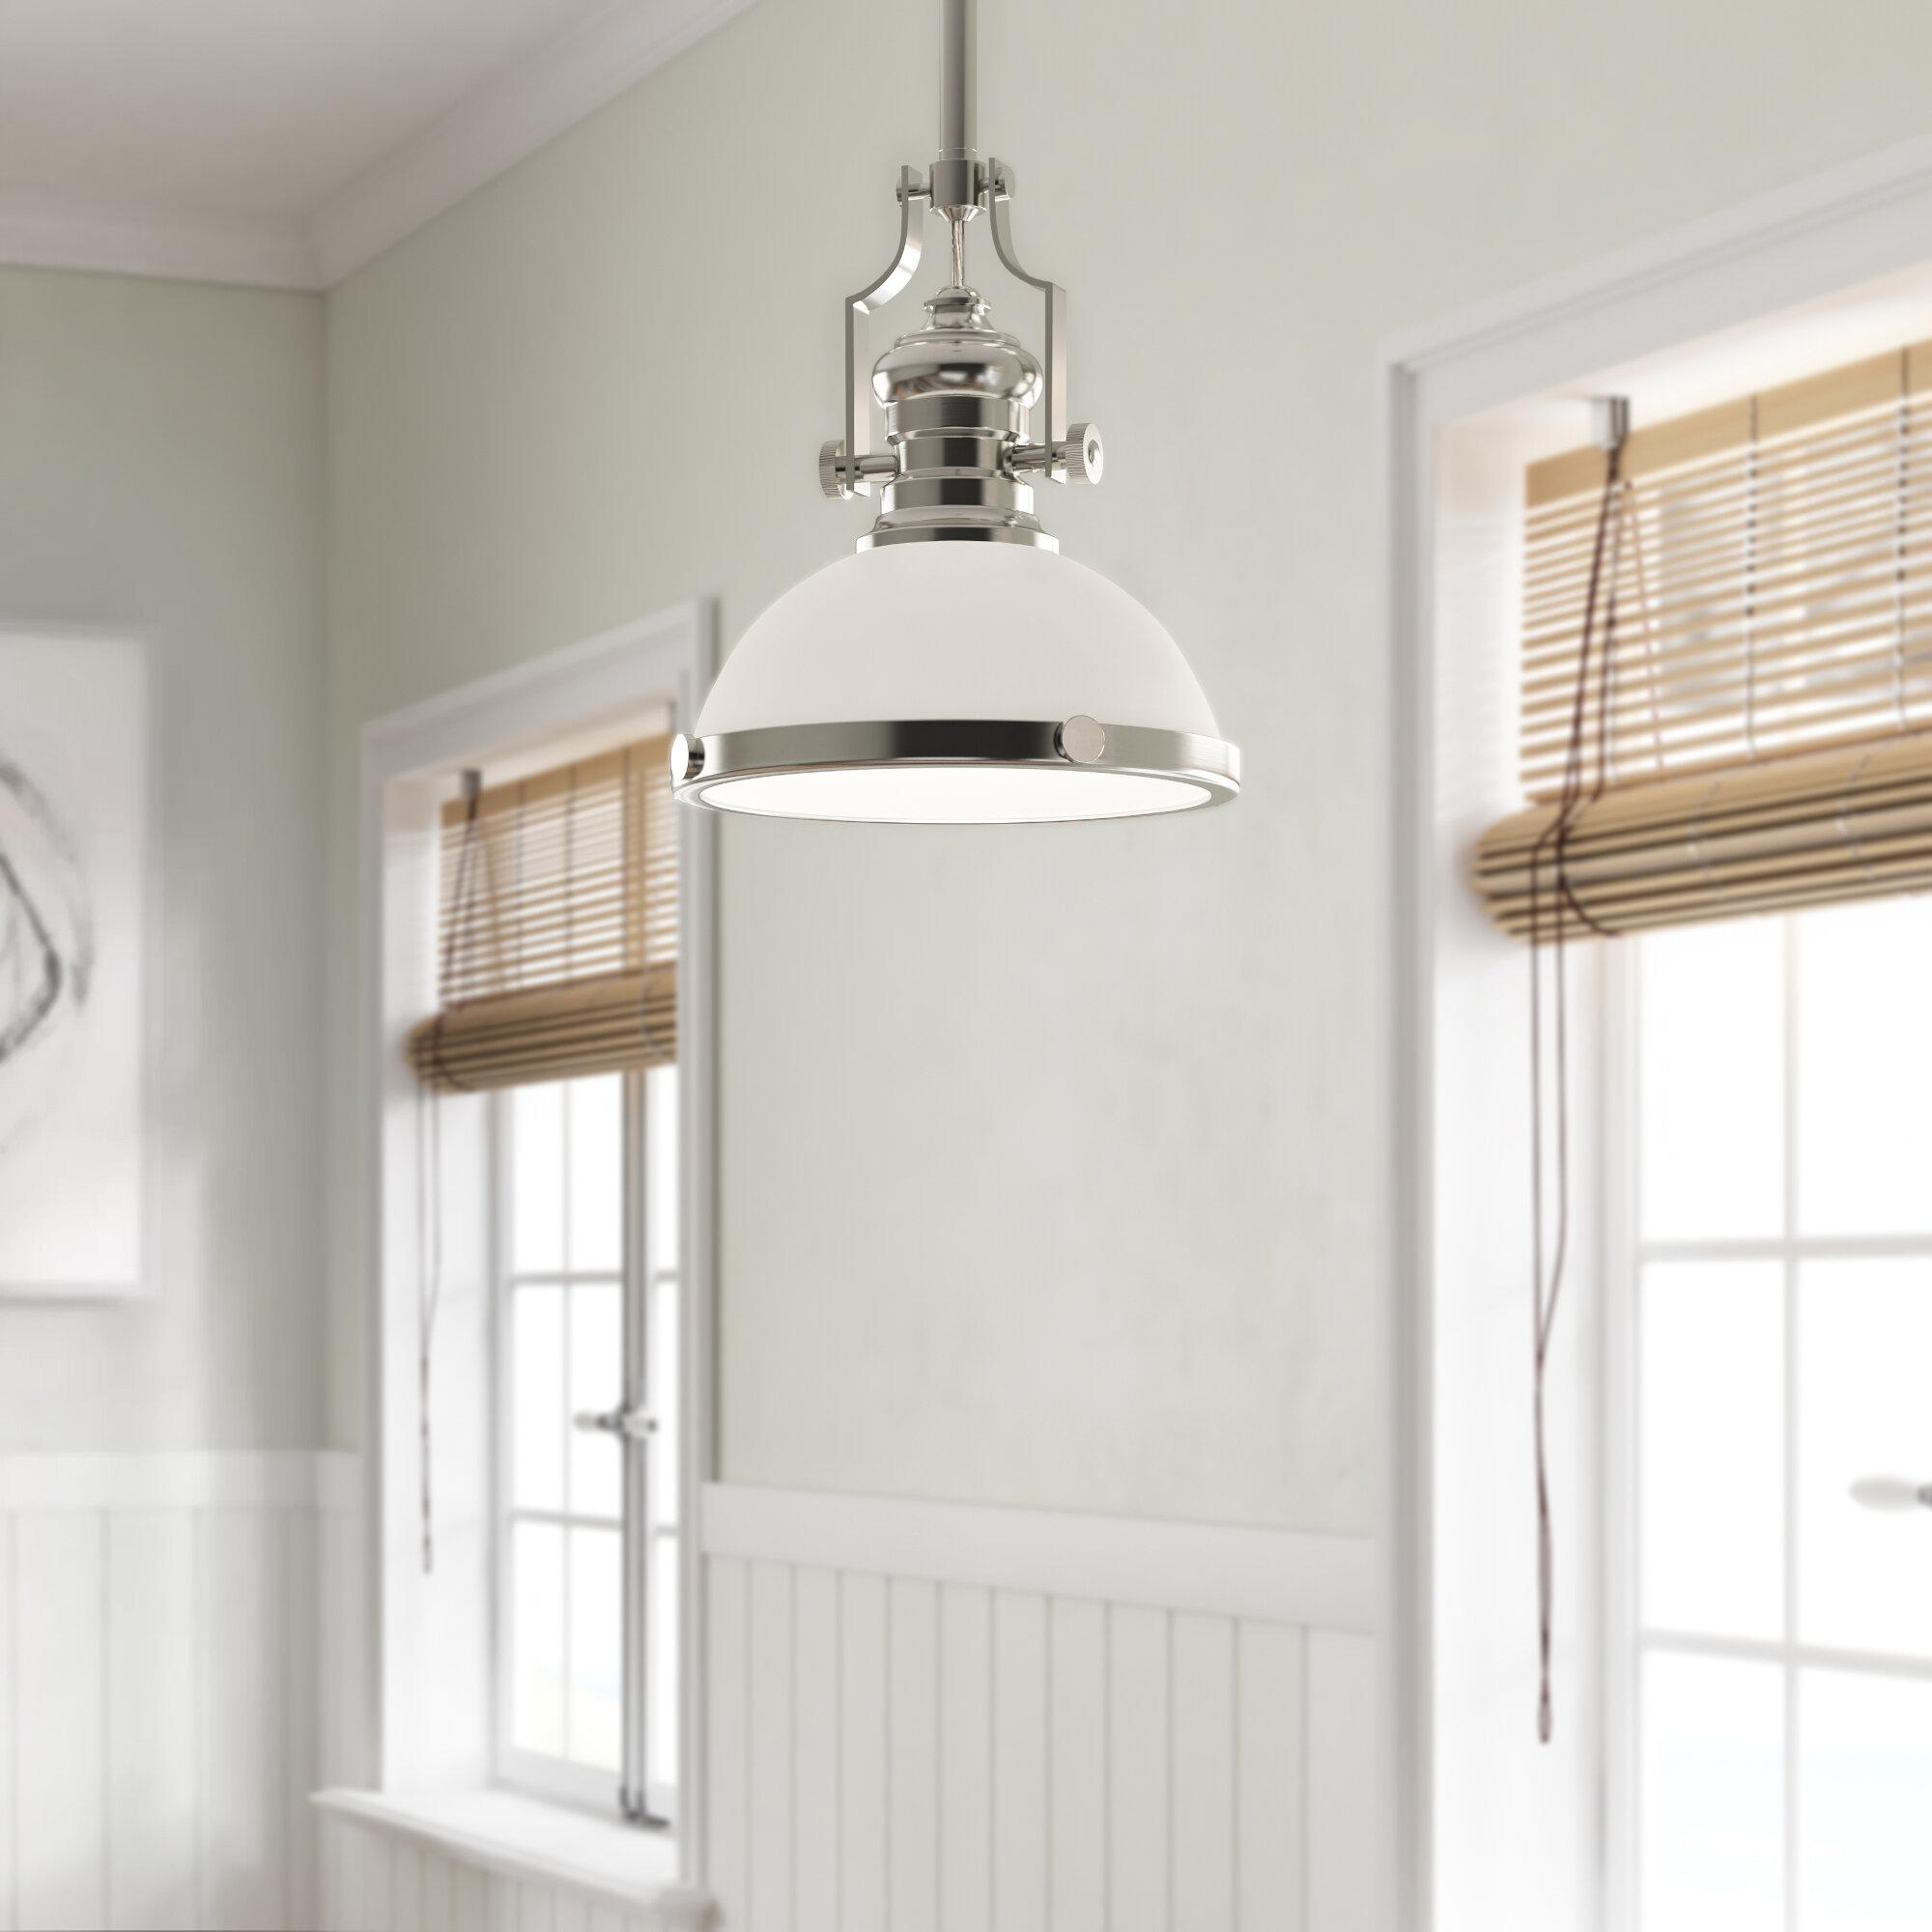 Attles 1 Light Dome Pendant – Inspirational Lighting Design within Macon 1-Light Single Dome Pendants (Image 9 of 30)